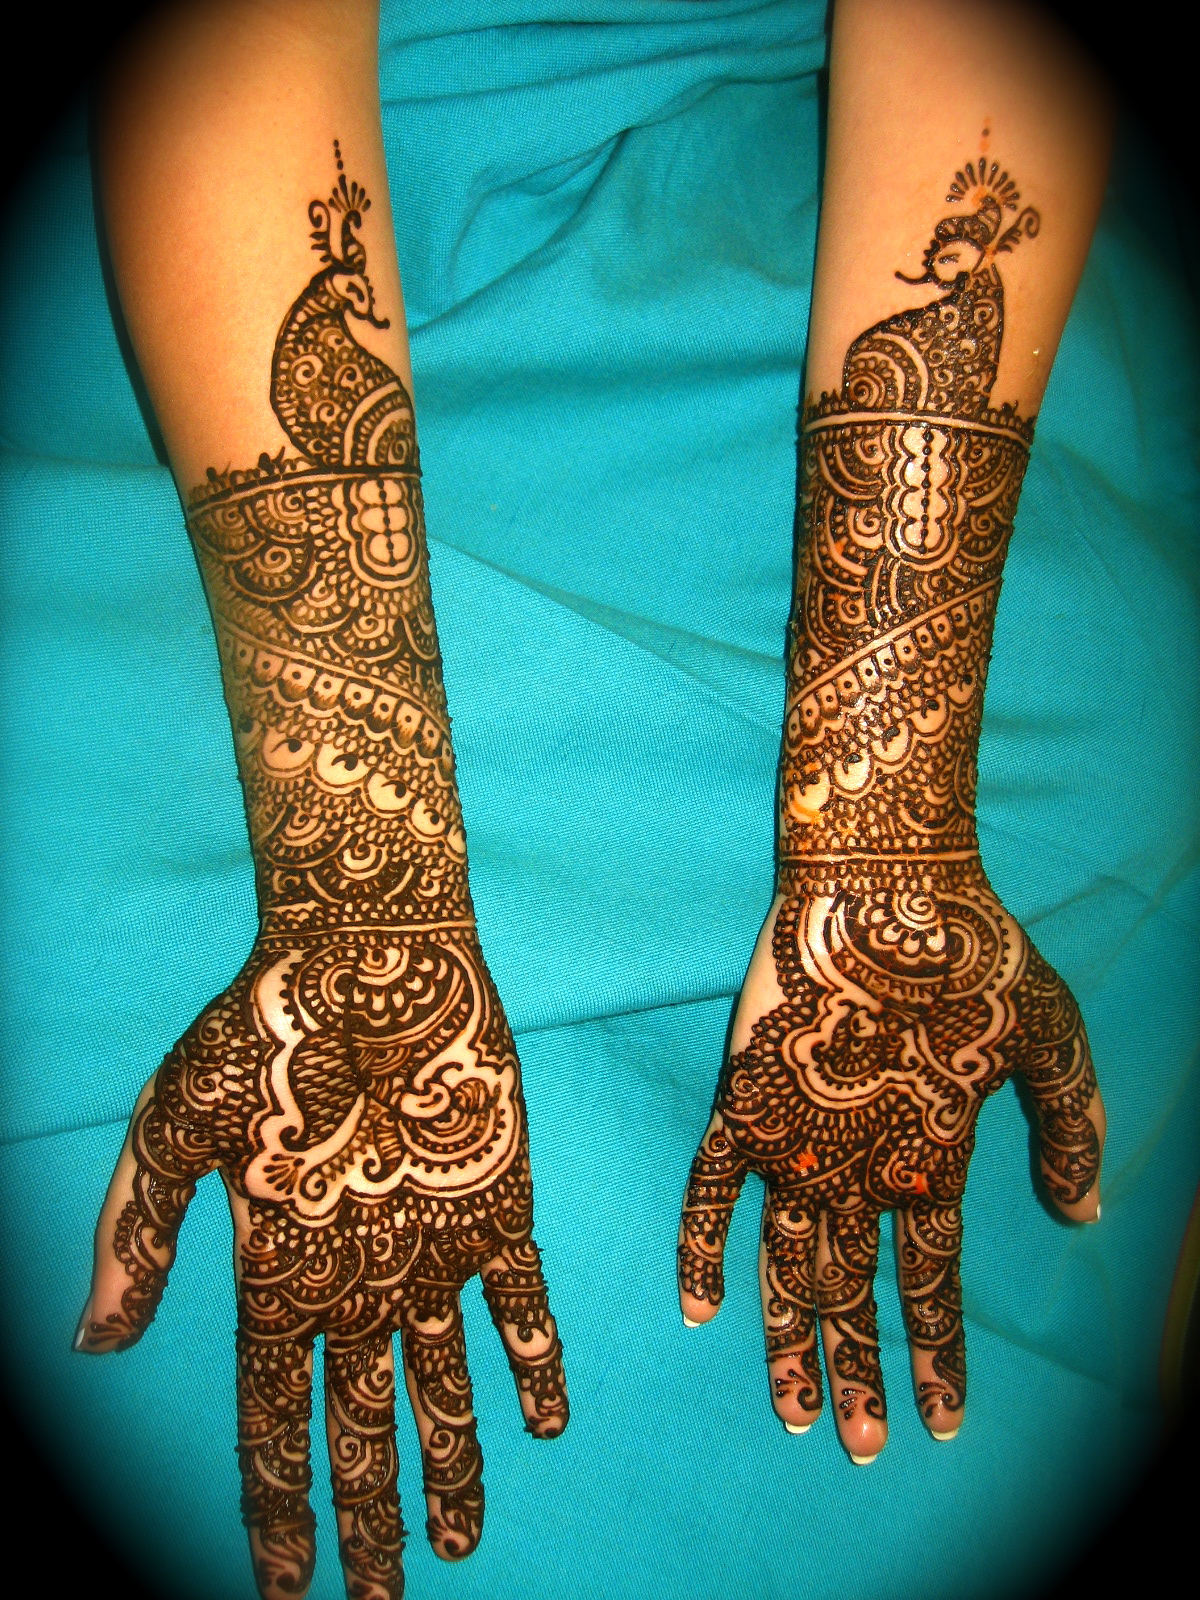 Grand Bridal Mehndi Designs : Grand mehndi designs for hands type cuonun